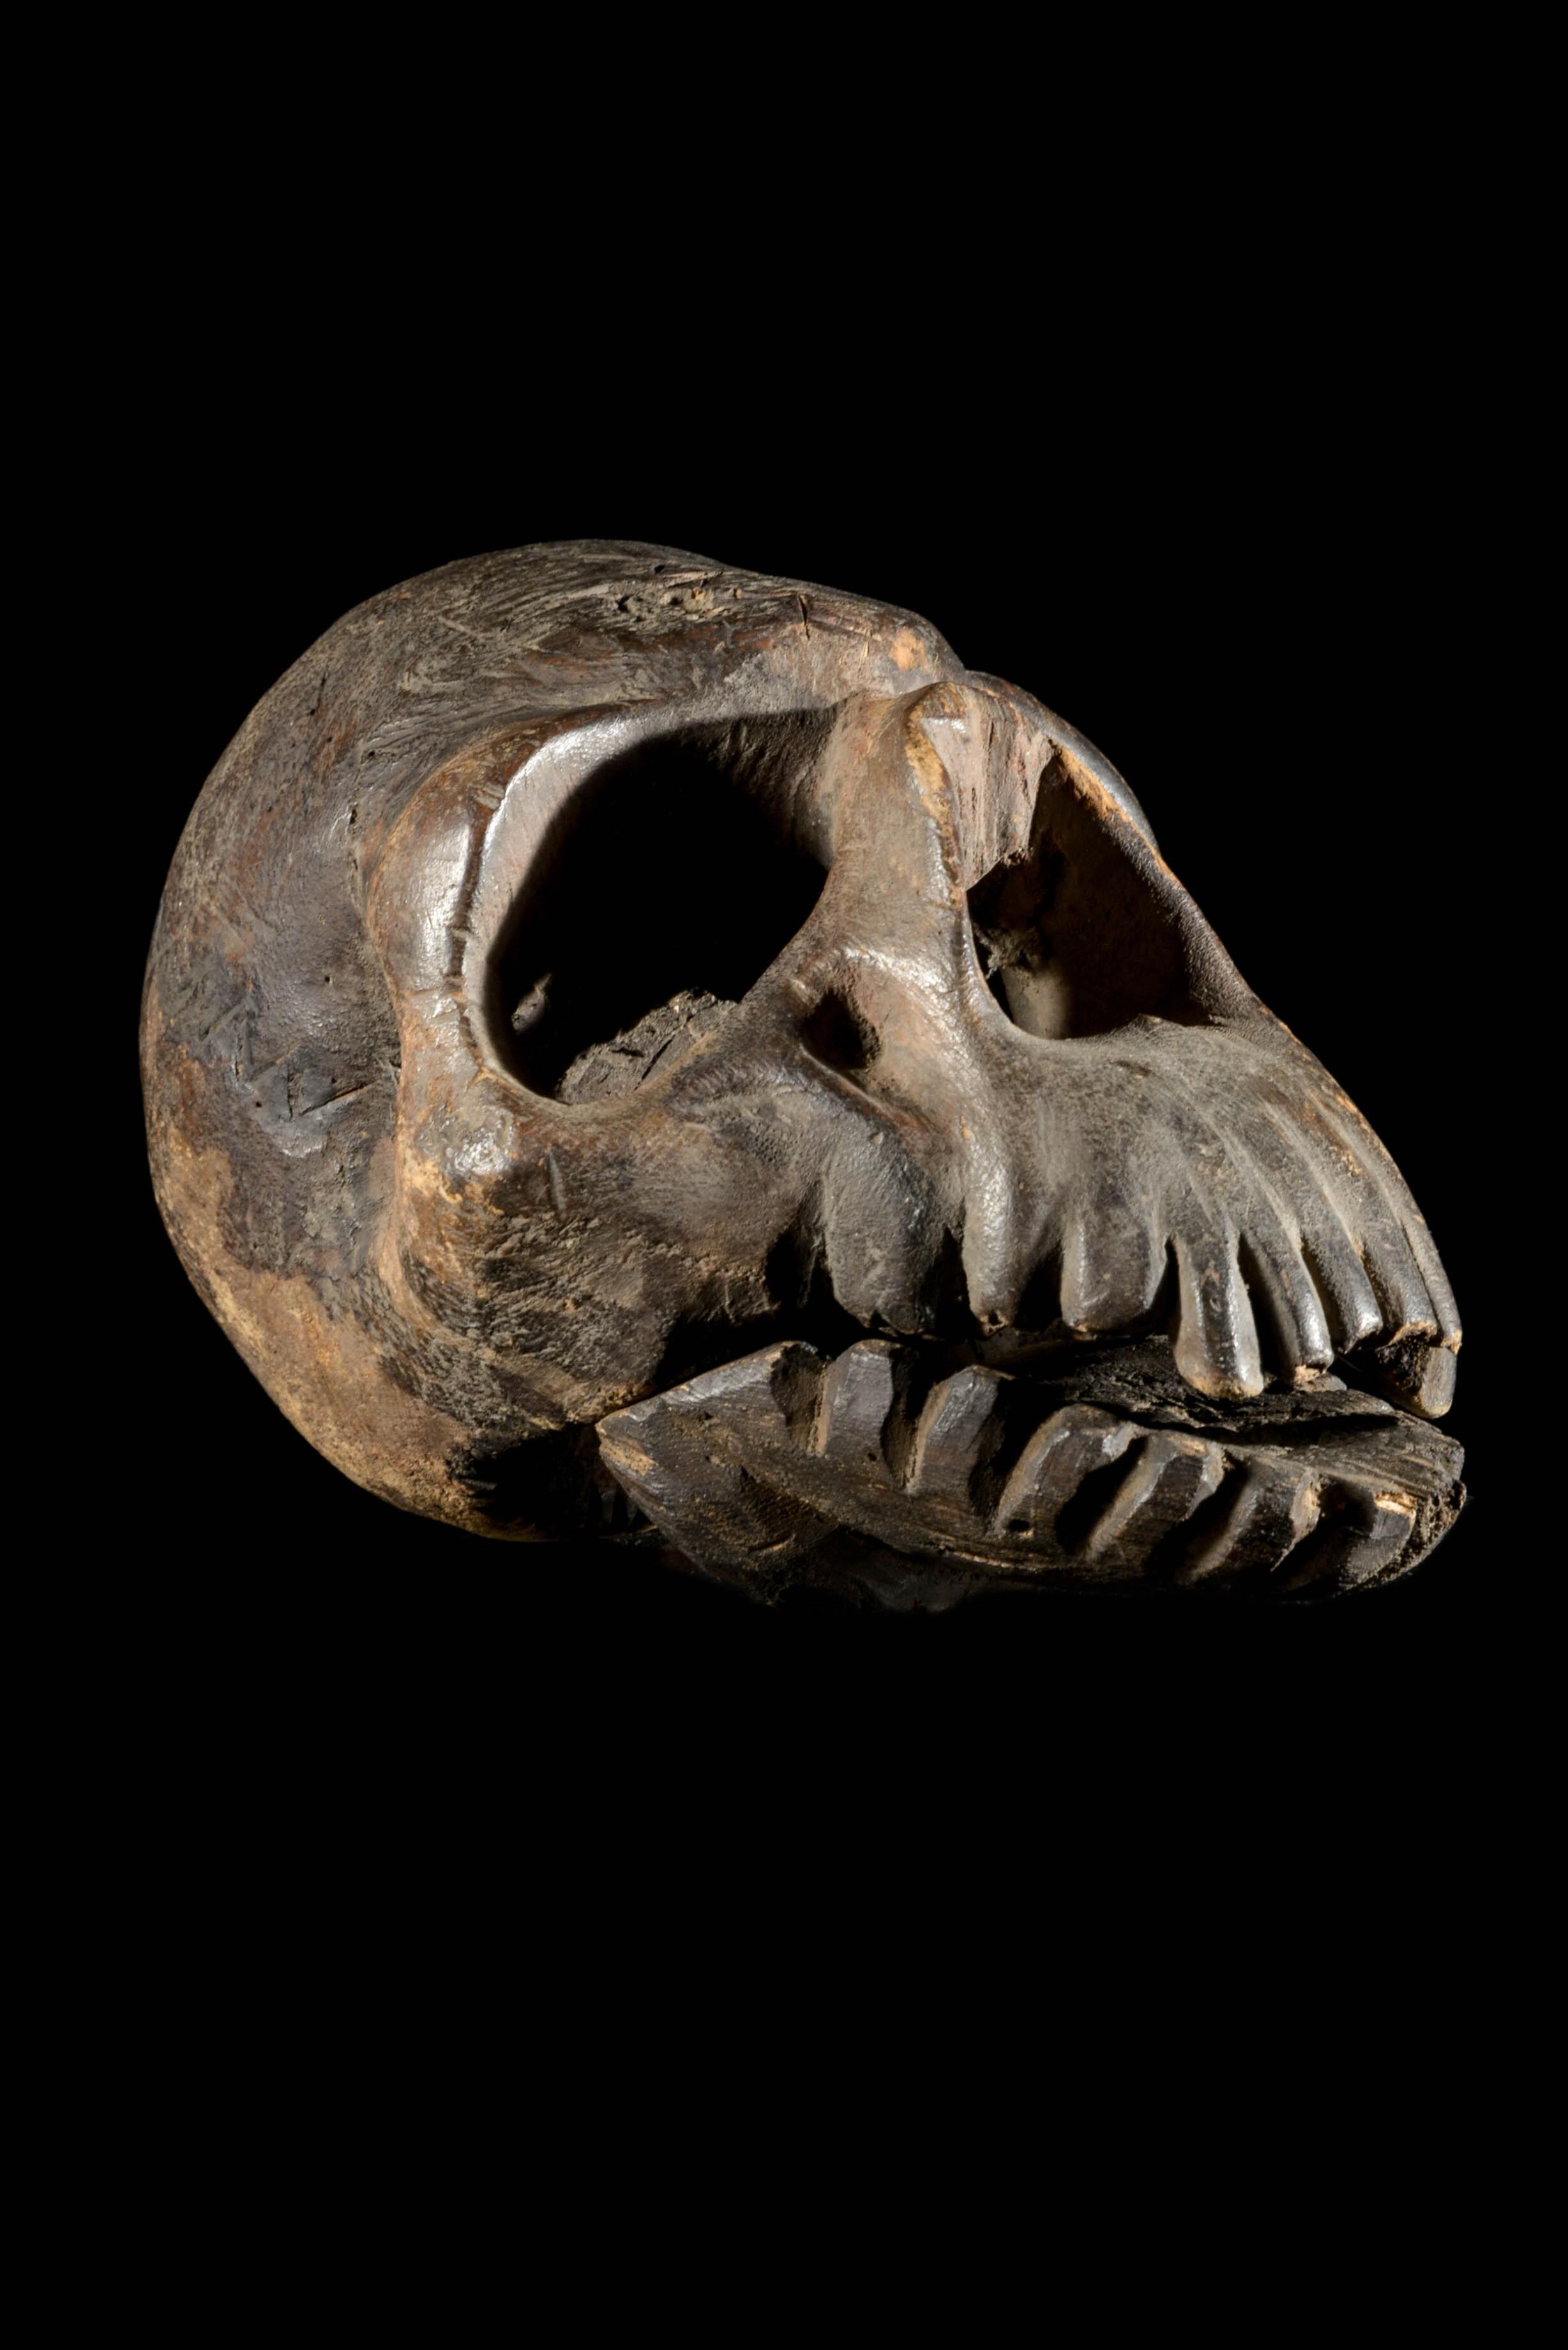 Crâne blond - Tiv - Nigeria